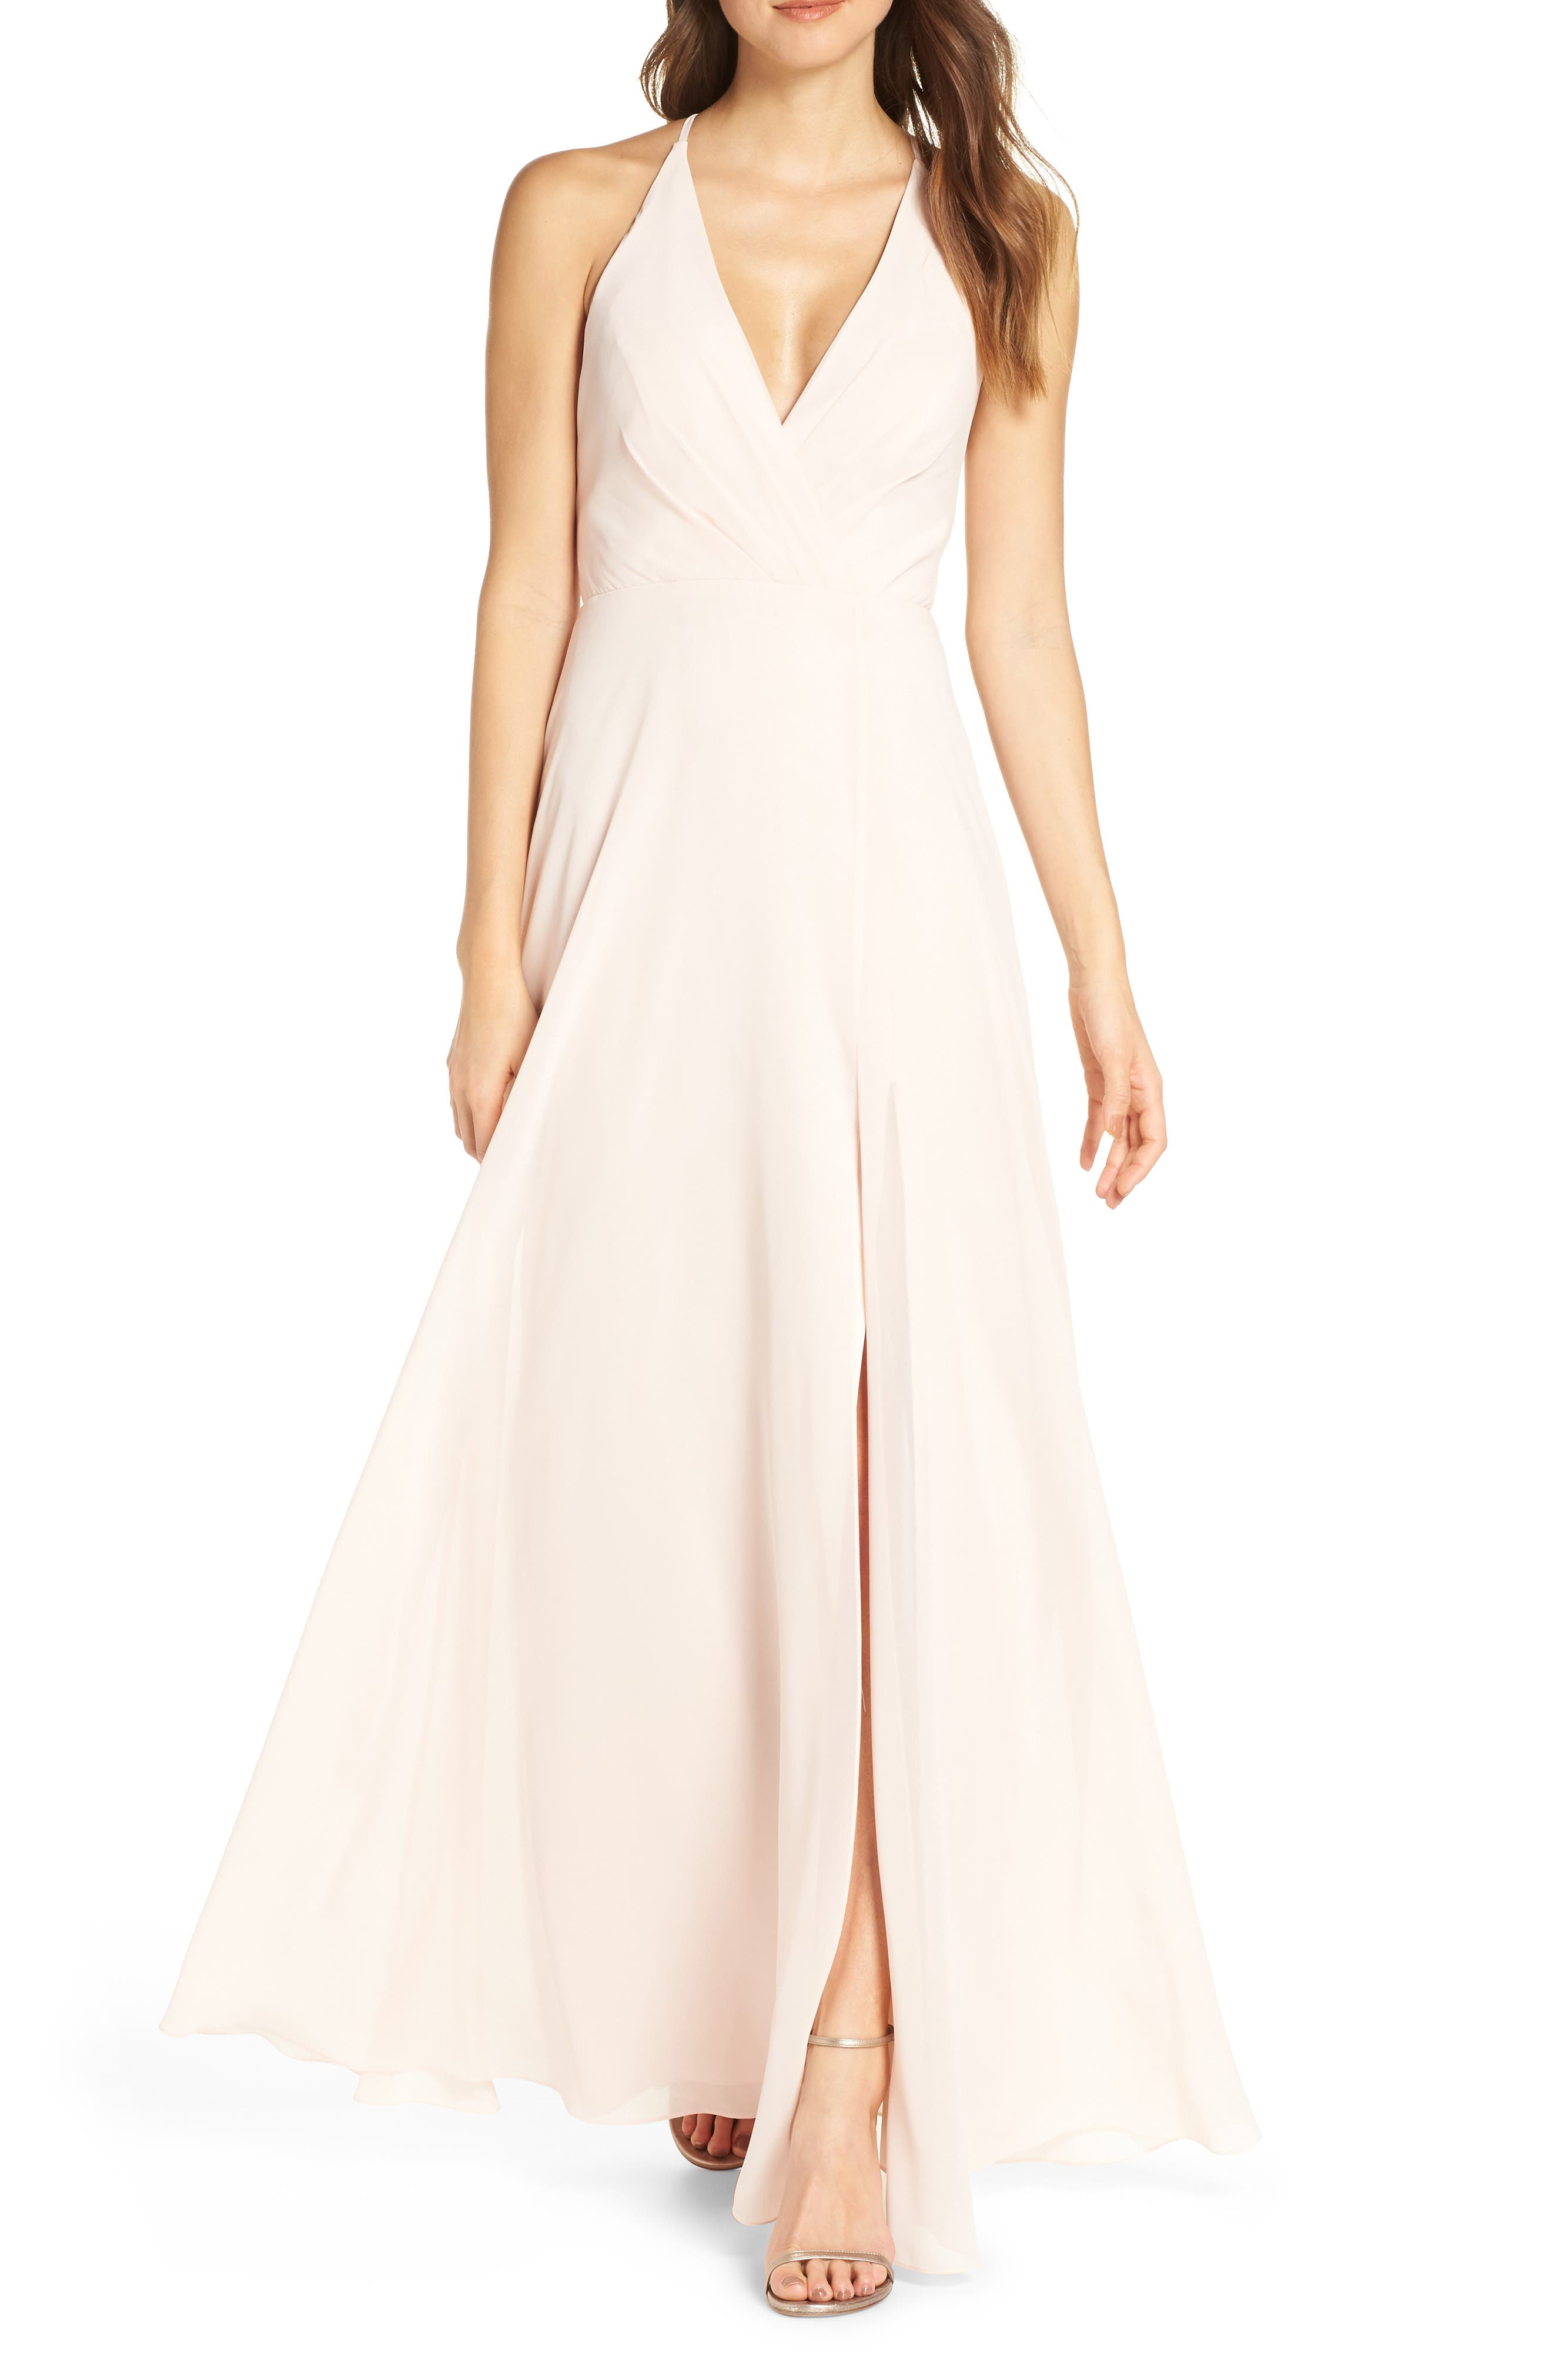 Jenny Yoo Bryce Surplice V-Neck Chiffon Evening Dress, Pink